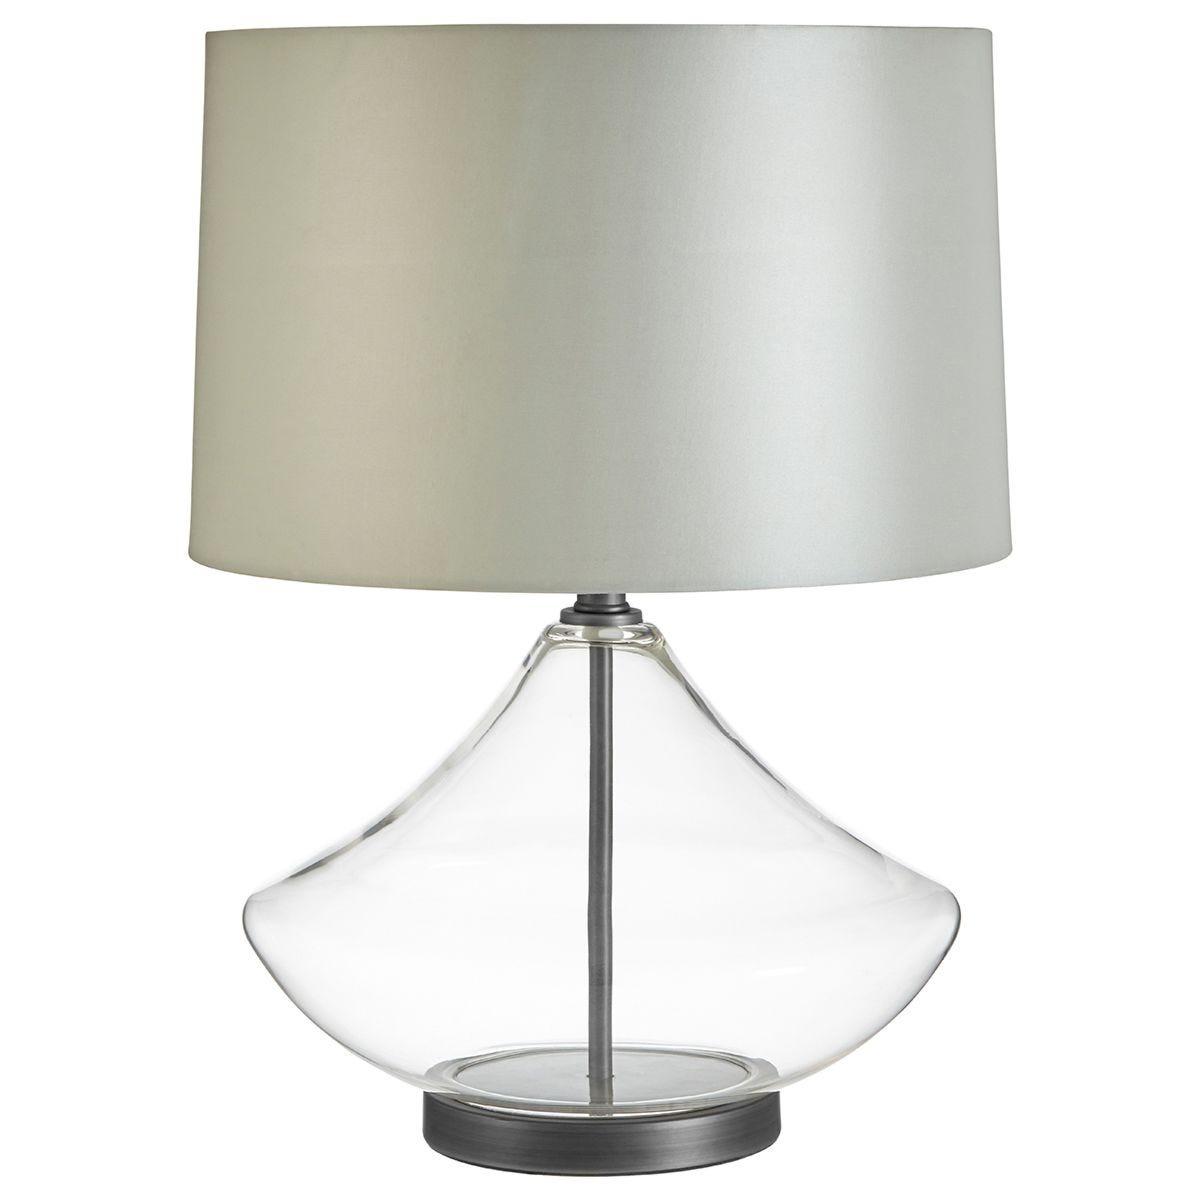 Premier Housewares Usha Table Lamp Light Grey Shade